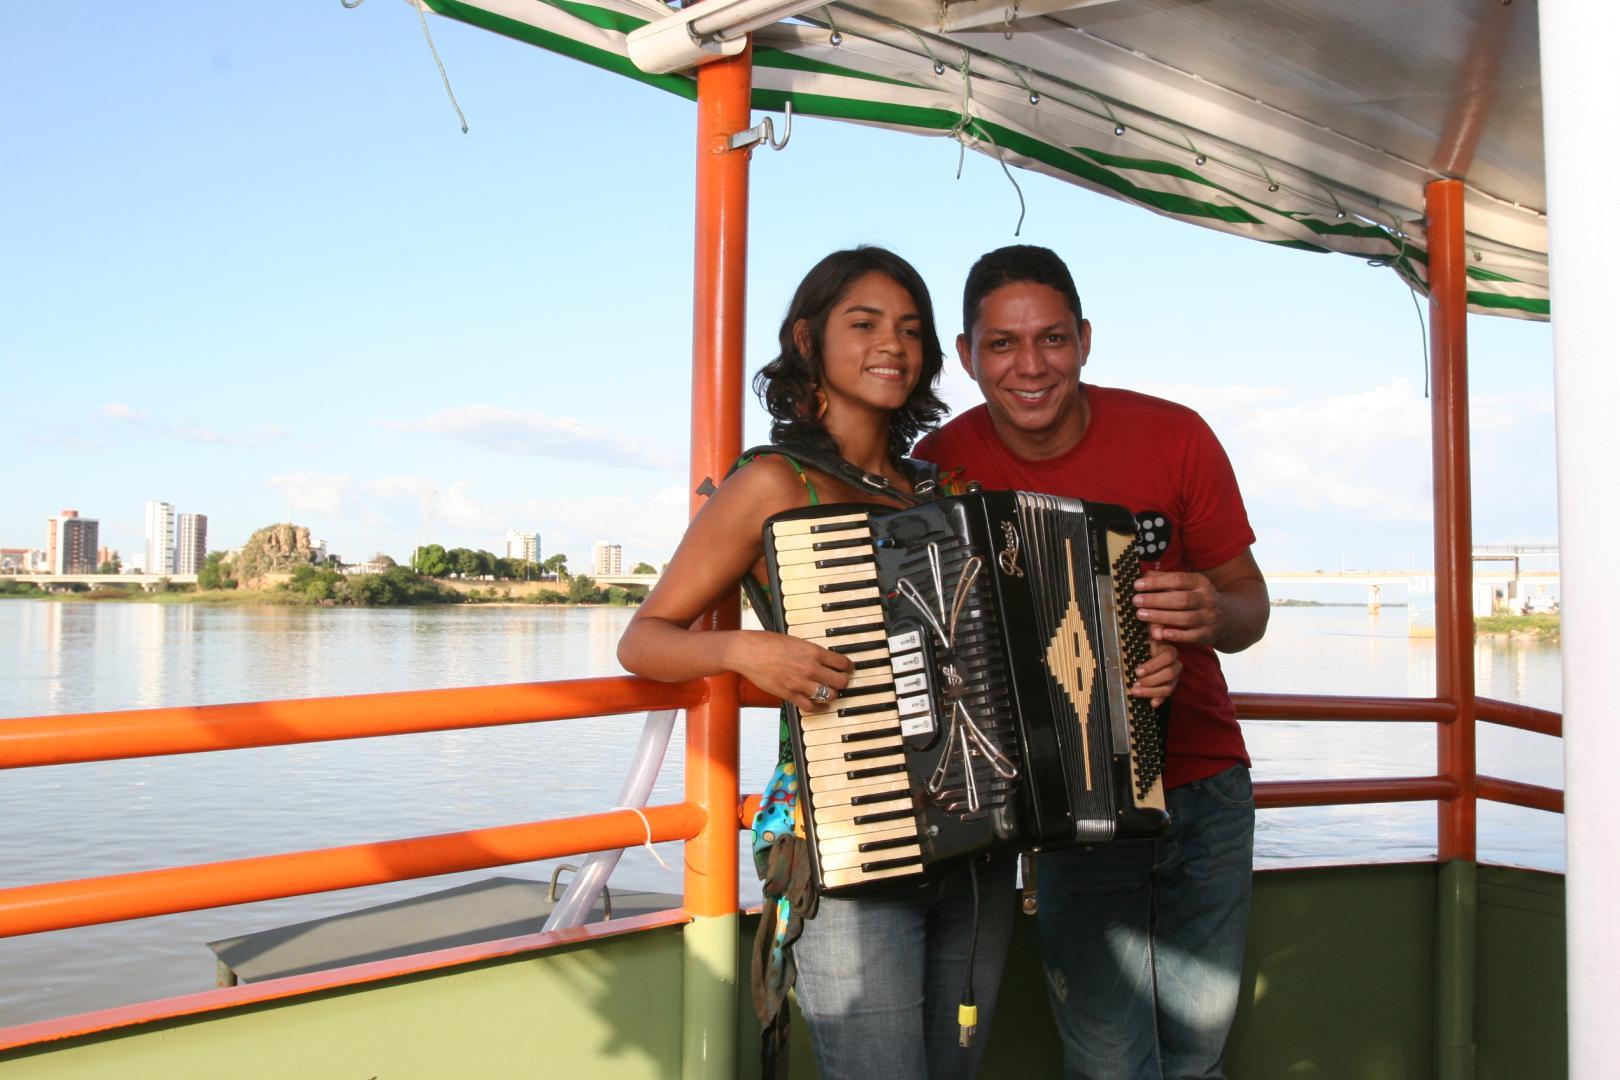 VII Festival Internacional da Sanfona